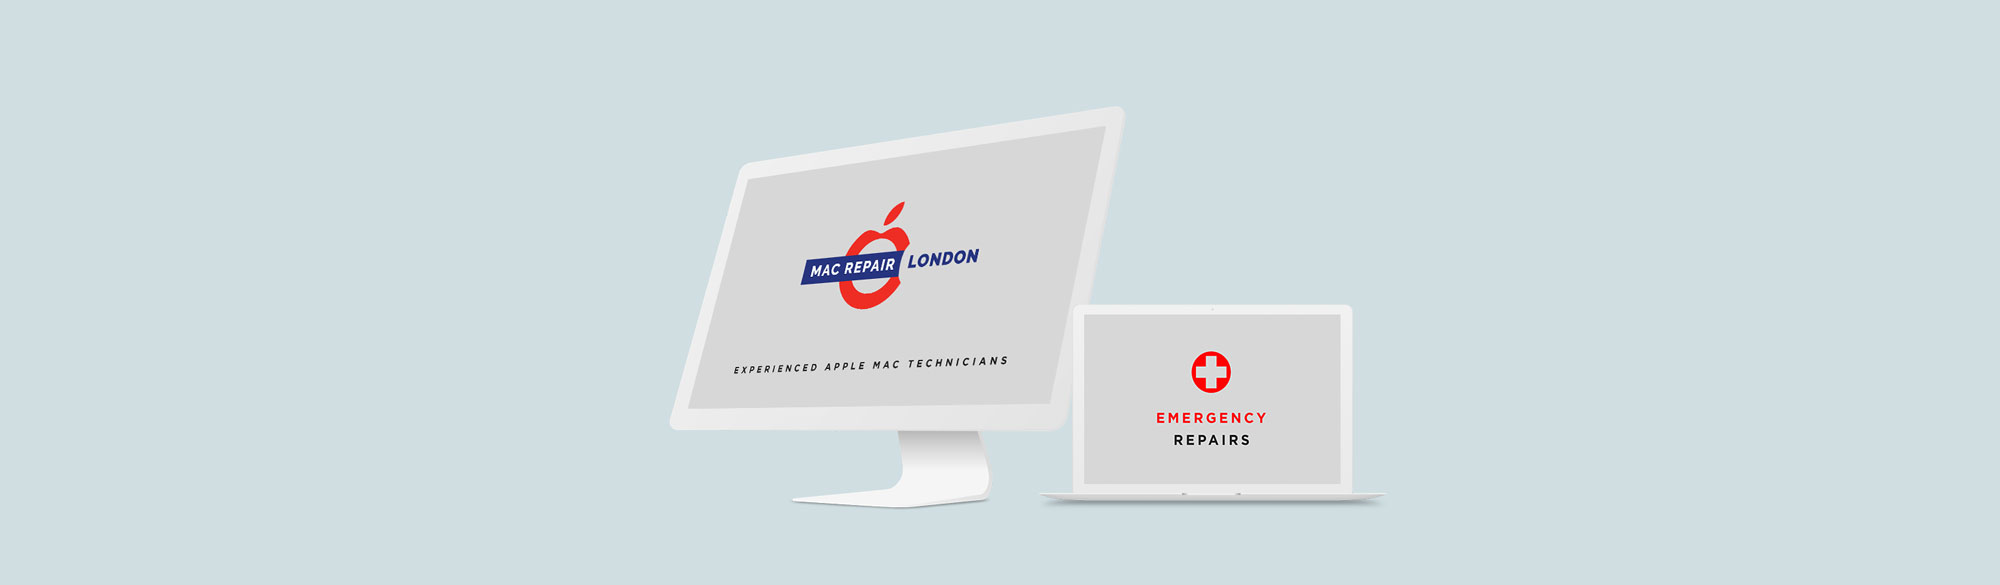 mac repairs london